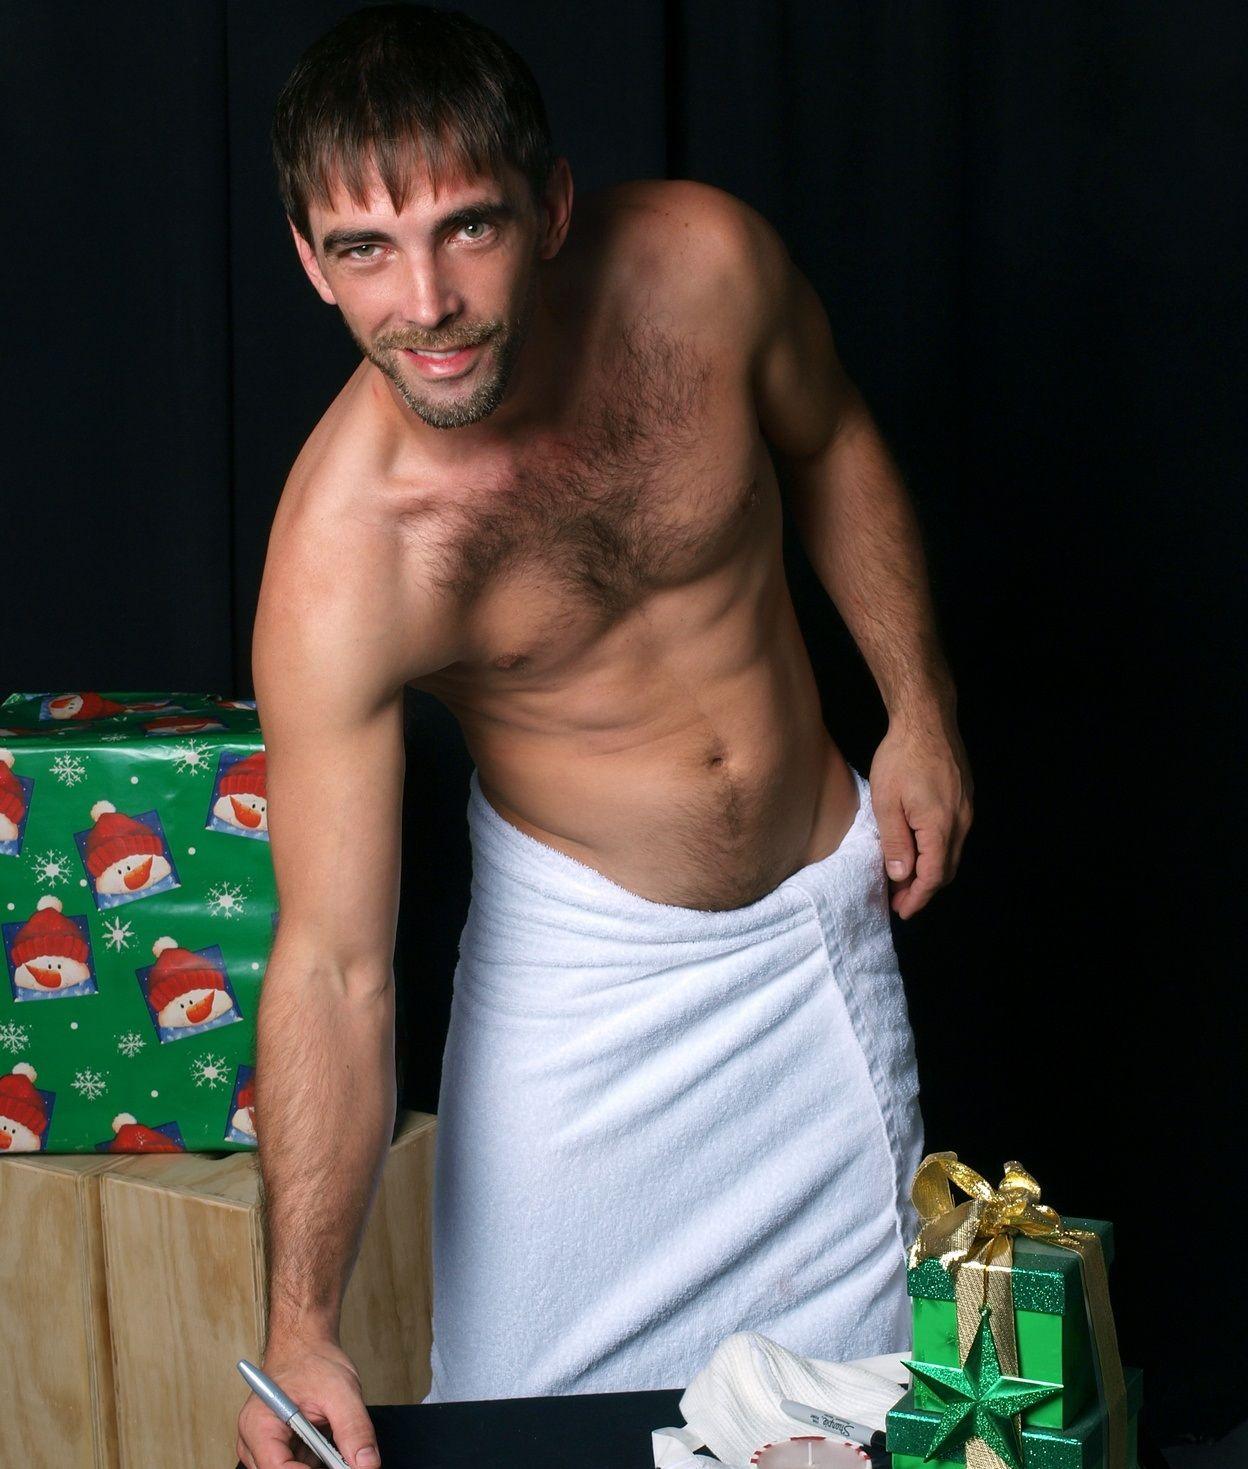 Joe Parker writing his Christmas list   ♂ Hunky Santas and New Year ...